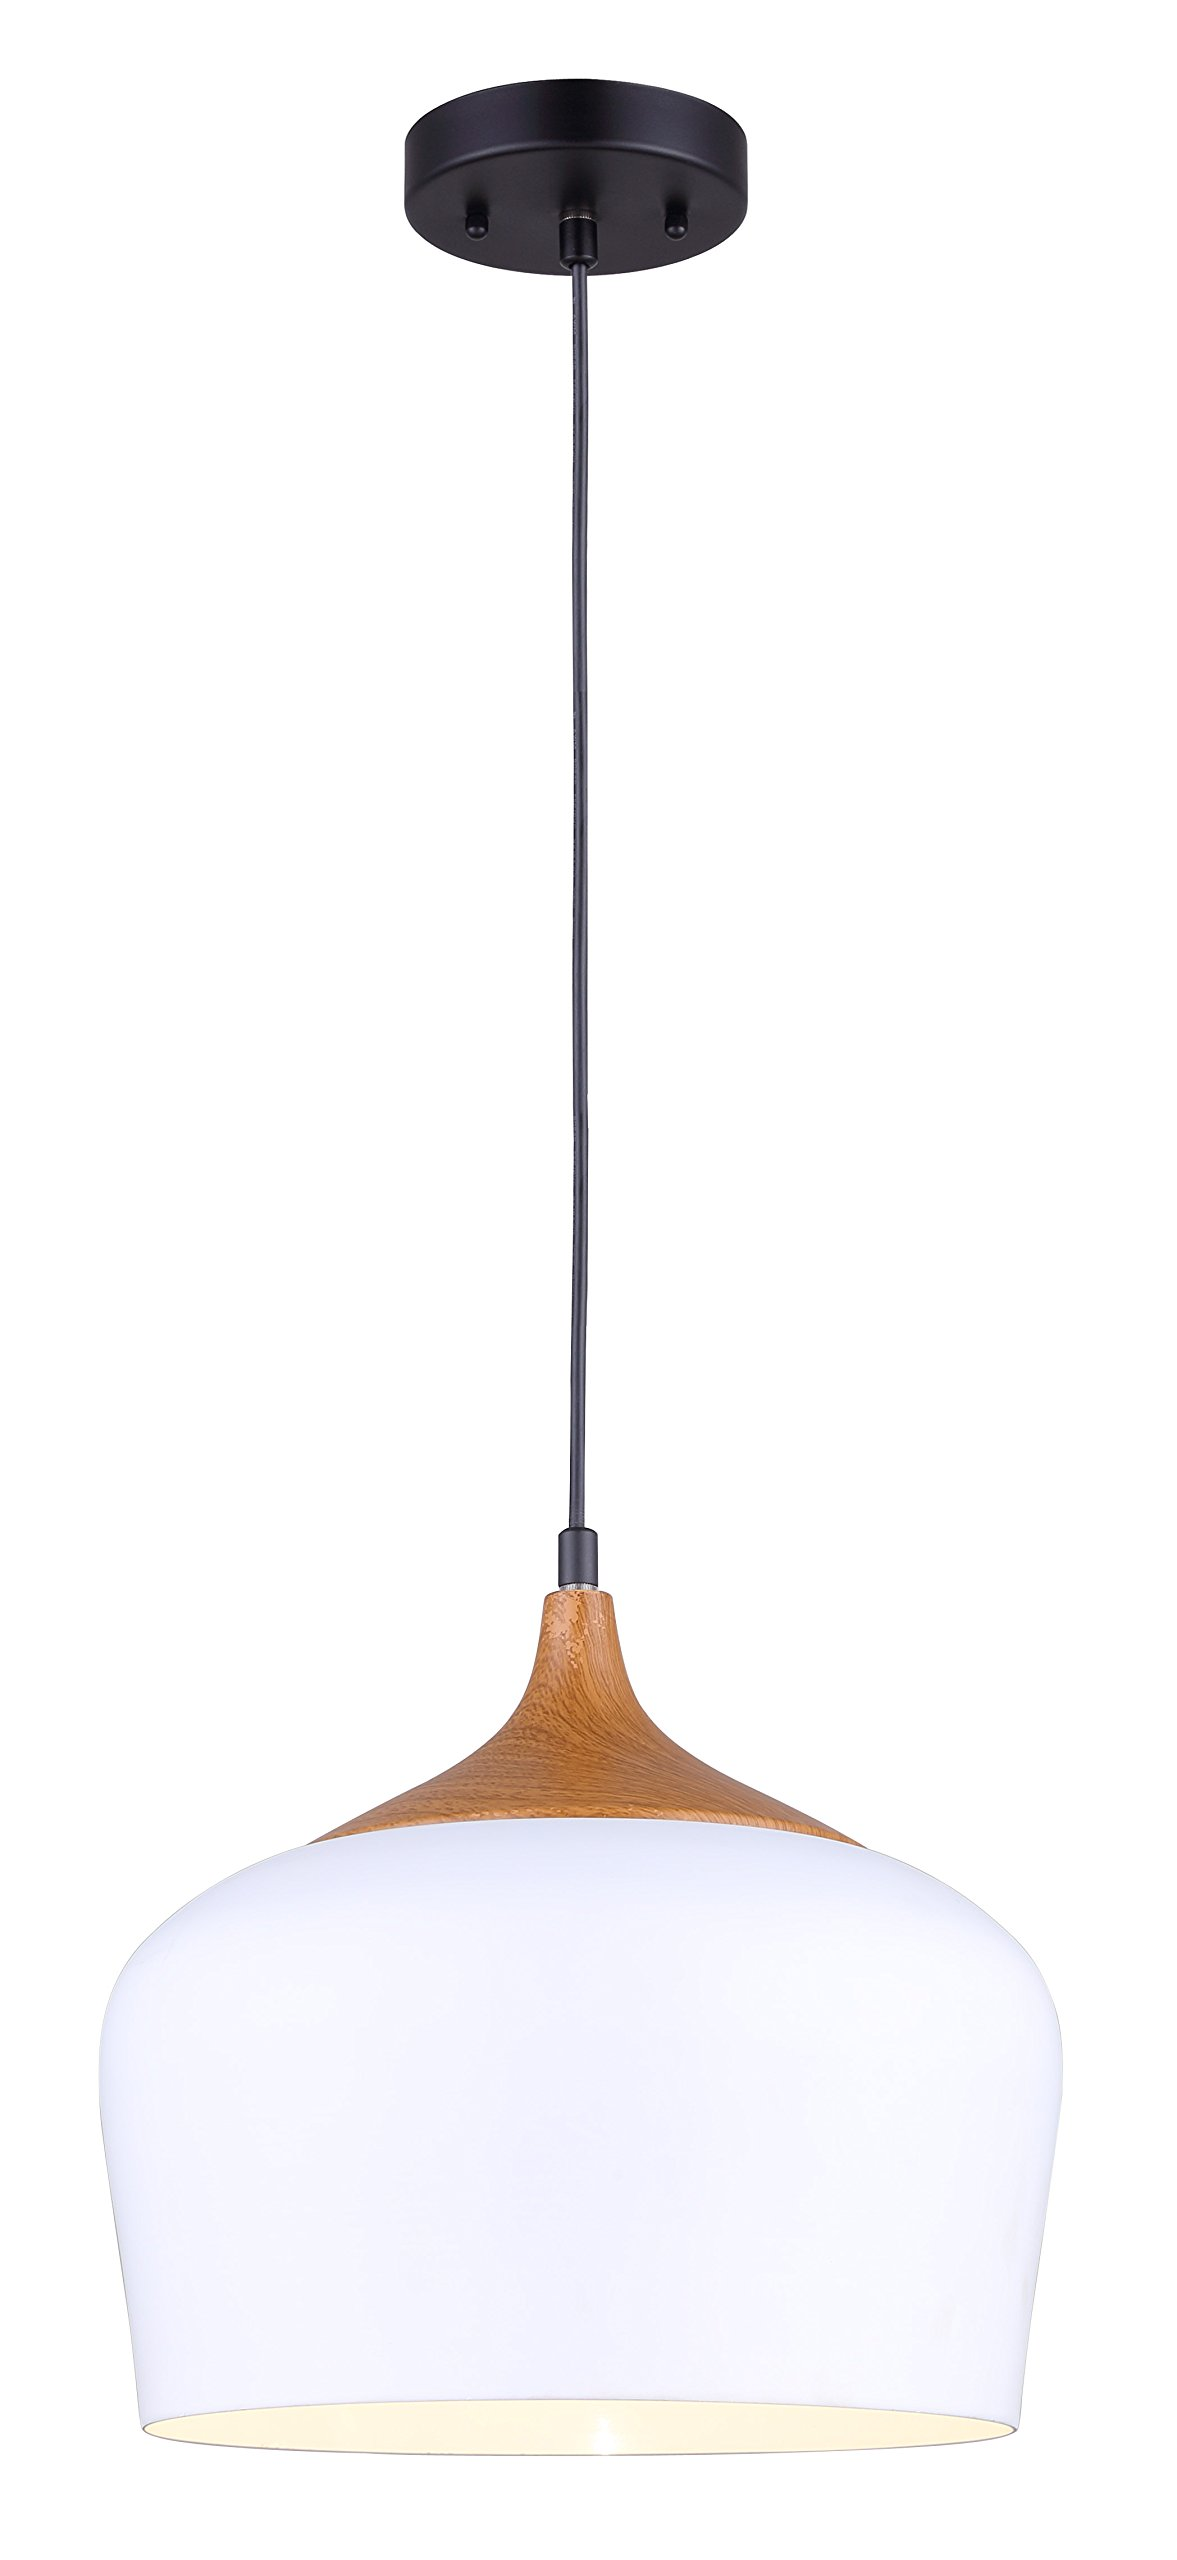 CANARM IPL614A01WH LTD Raphael 1 Light Cord Pendant White Aluminum Shade with Wood Accent